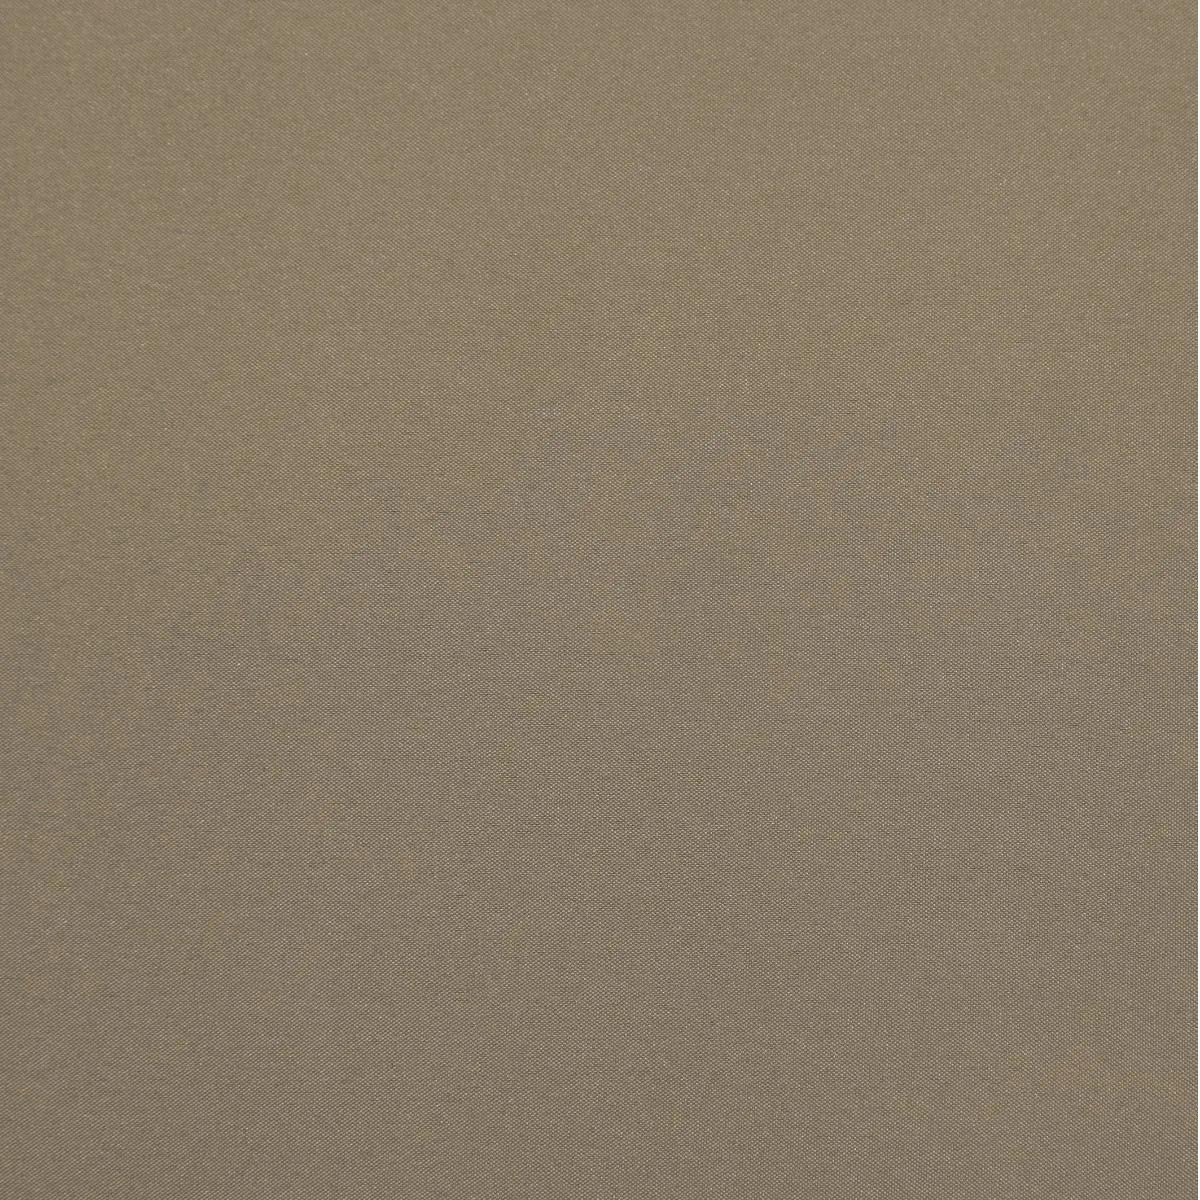 Cortina Blackout 100% Comfort Taupe 5,40 x 2,50 Bella Janela